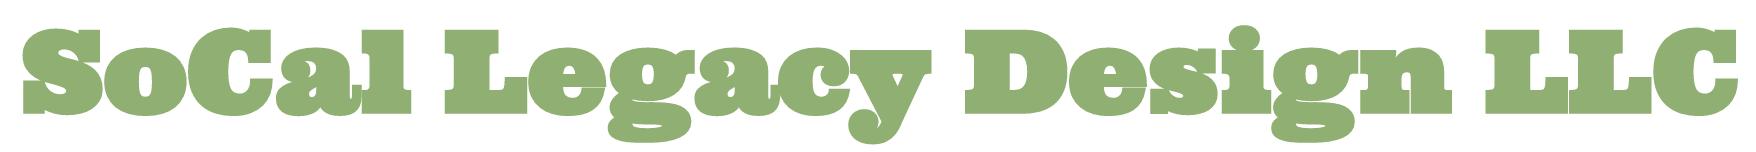 SoCal_Legacy_Design_logo.png